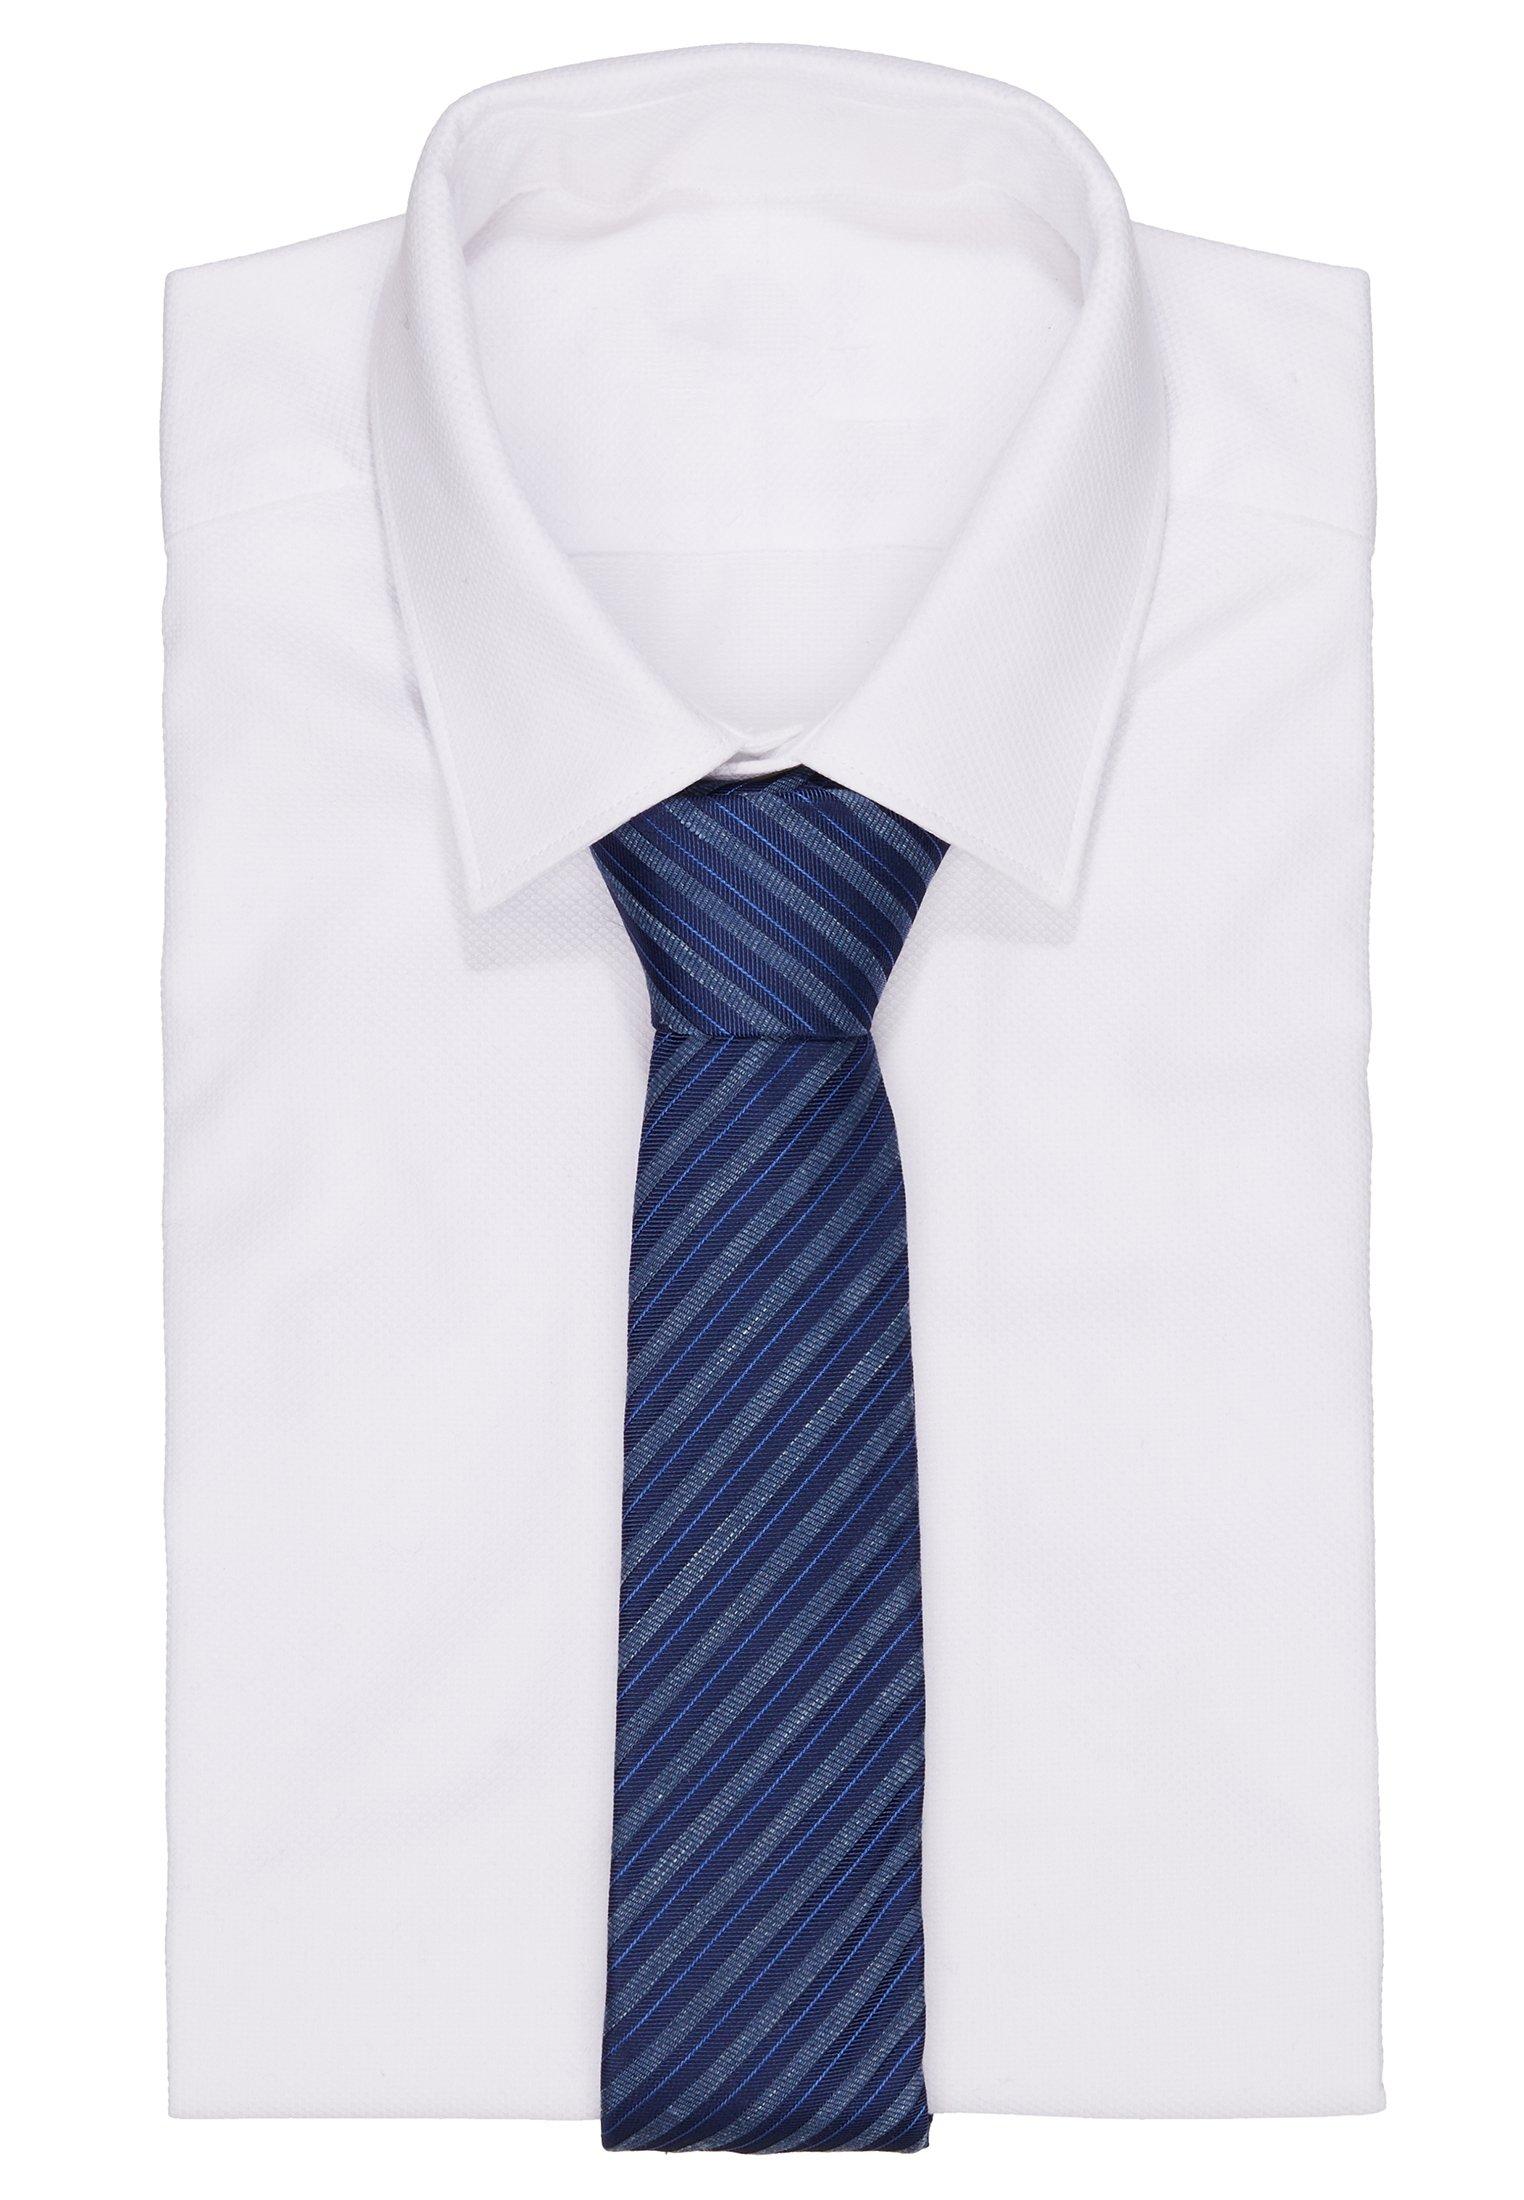 Calvin Klein Bold Season Duo Stripe Tie - Krawat Navy